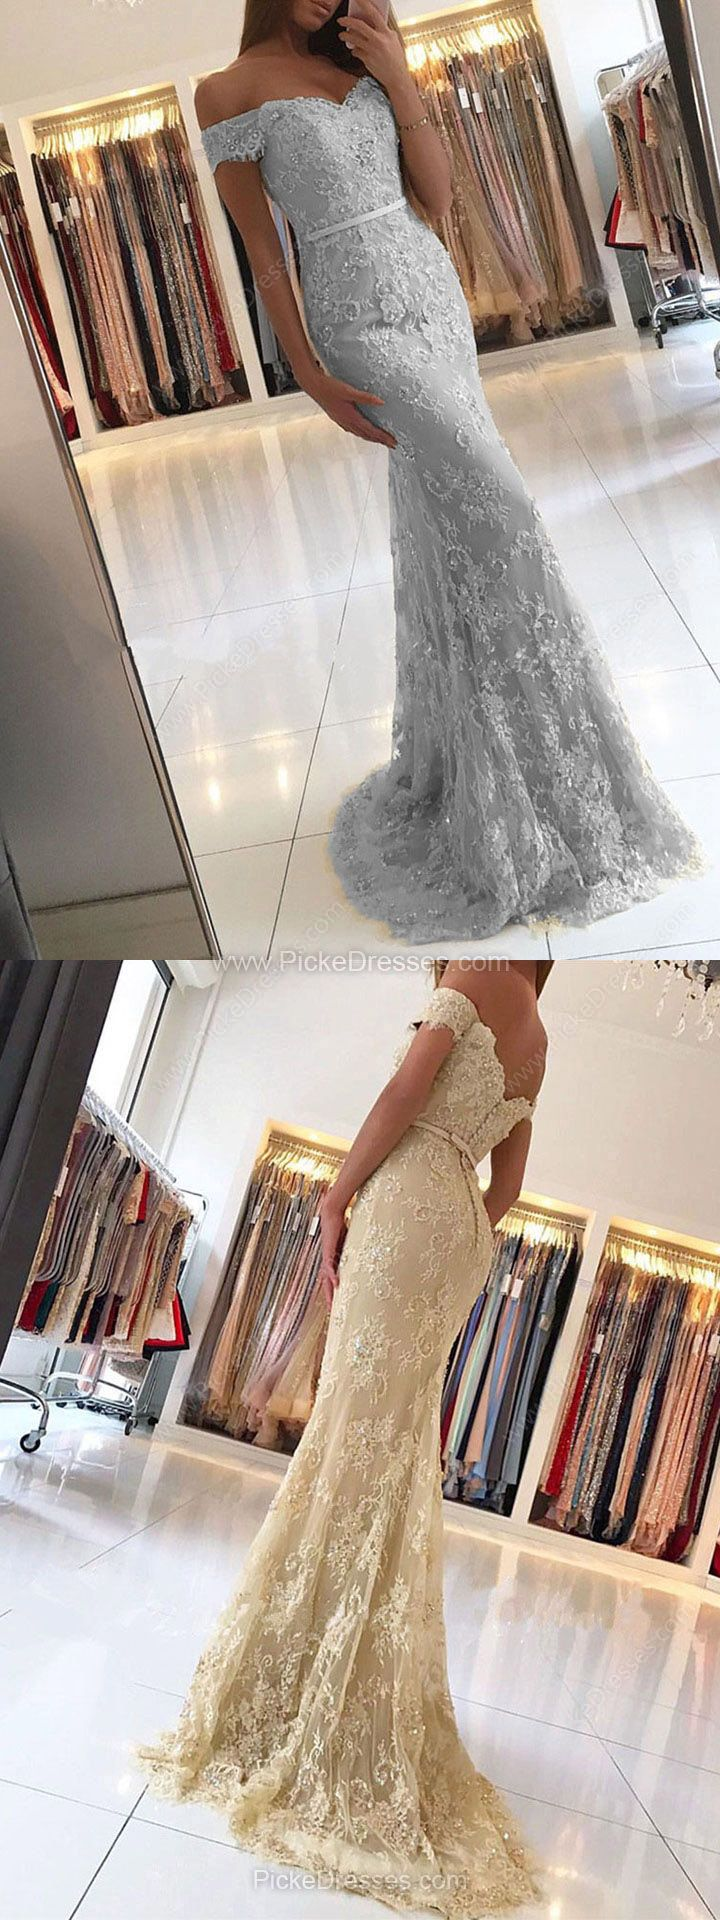 Lace prom dressestrumpetmermaid prom dresses offtheshoulder